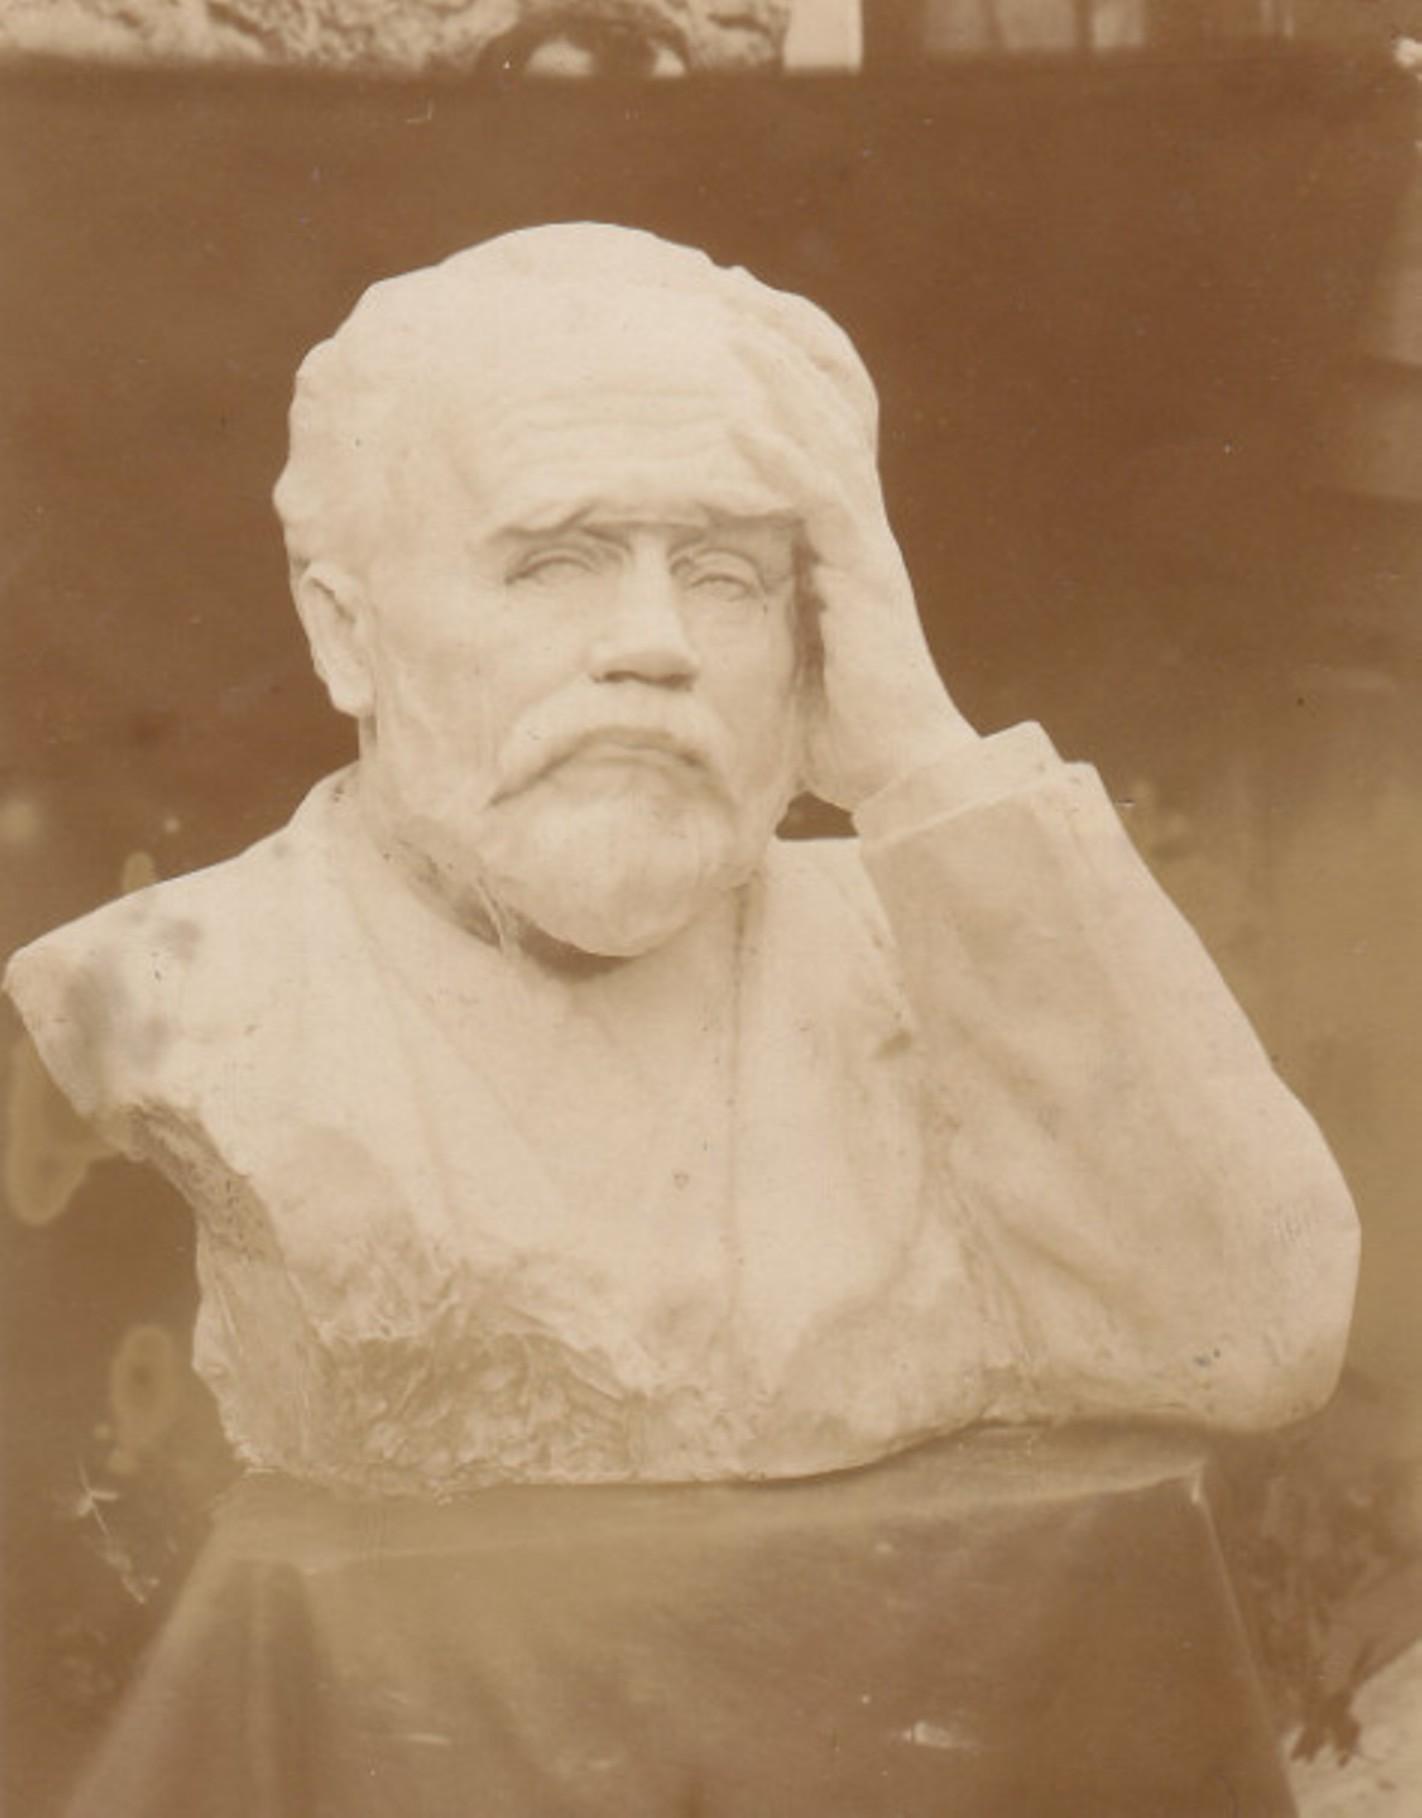 Image - Buste d'Emile Zola